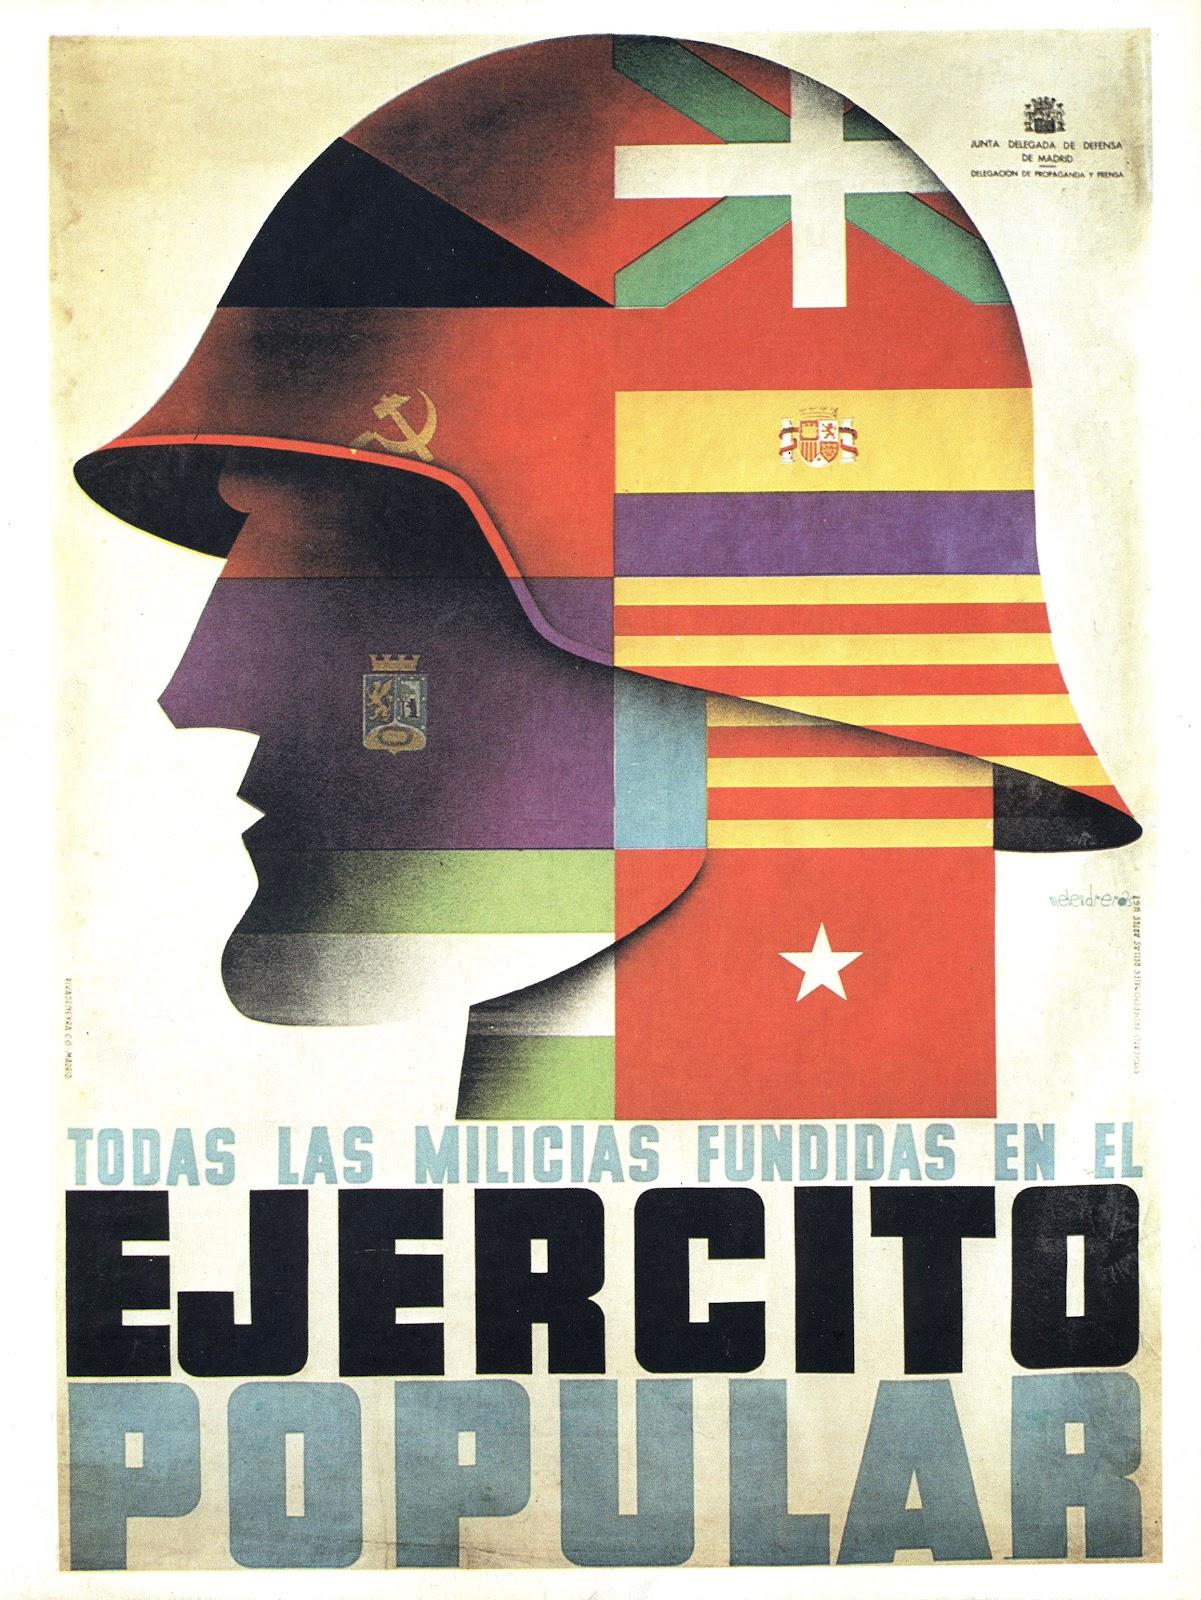 Un.Rincón.de.Sombra: Carteles de la Guerra Civil Española